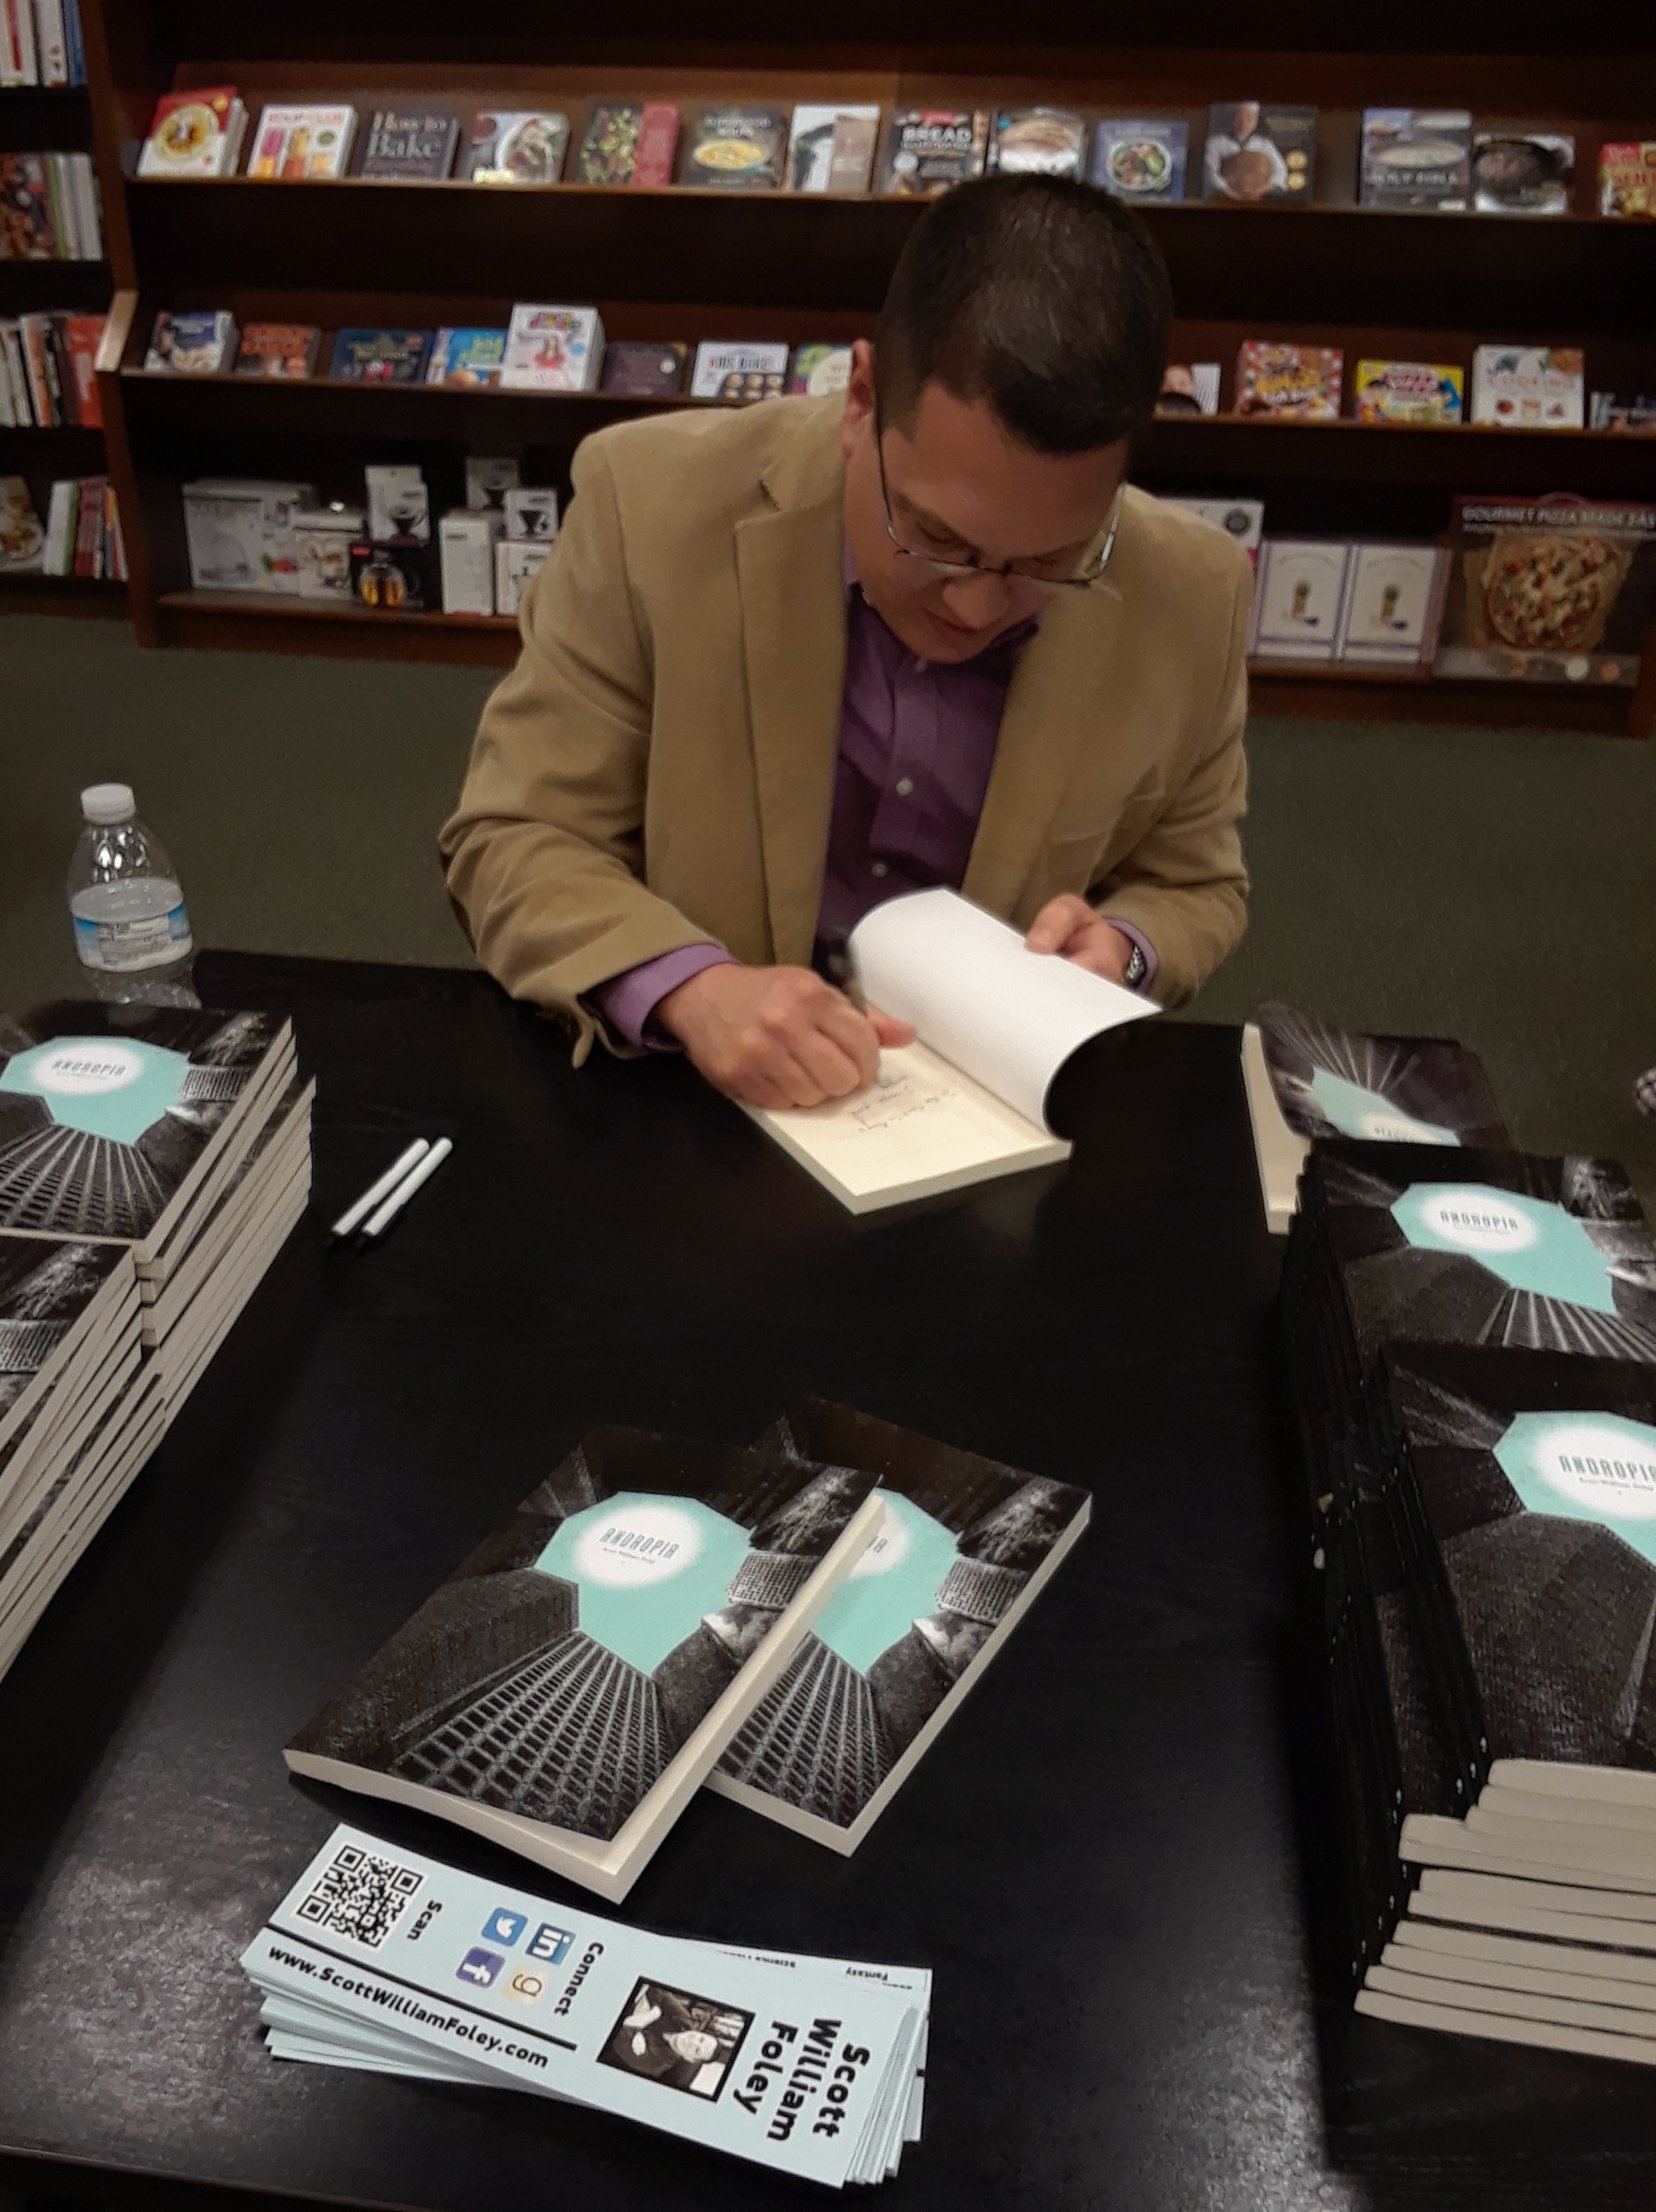 BN Signing 10212018 Book Signing.jpg